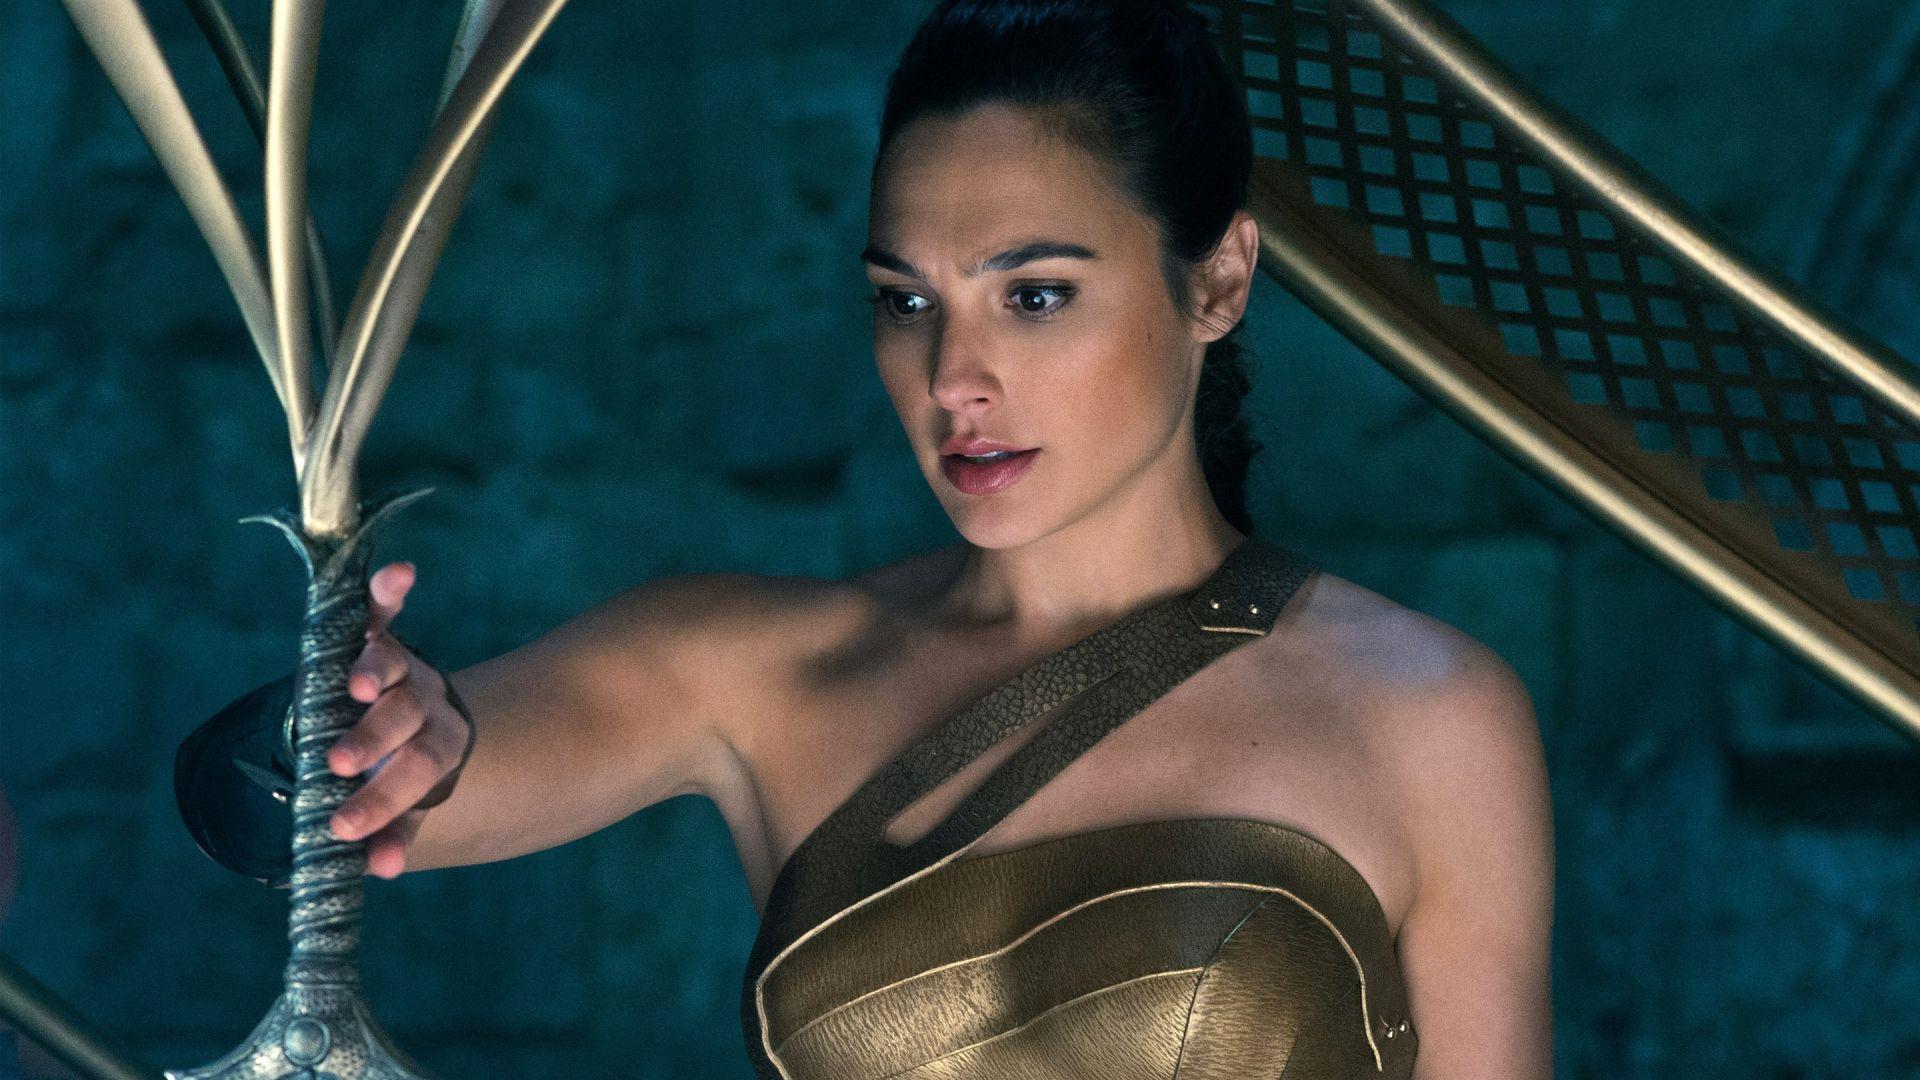 Wallpaper Gal Gadot as wonder woman, 2017 movie, sword